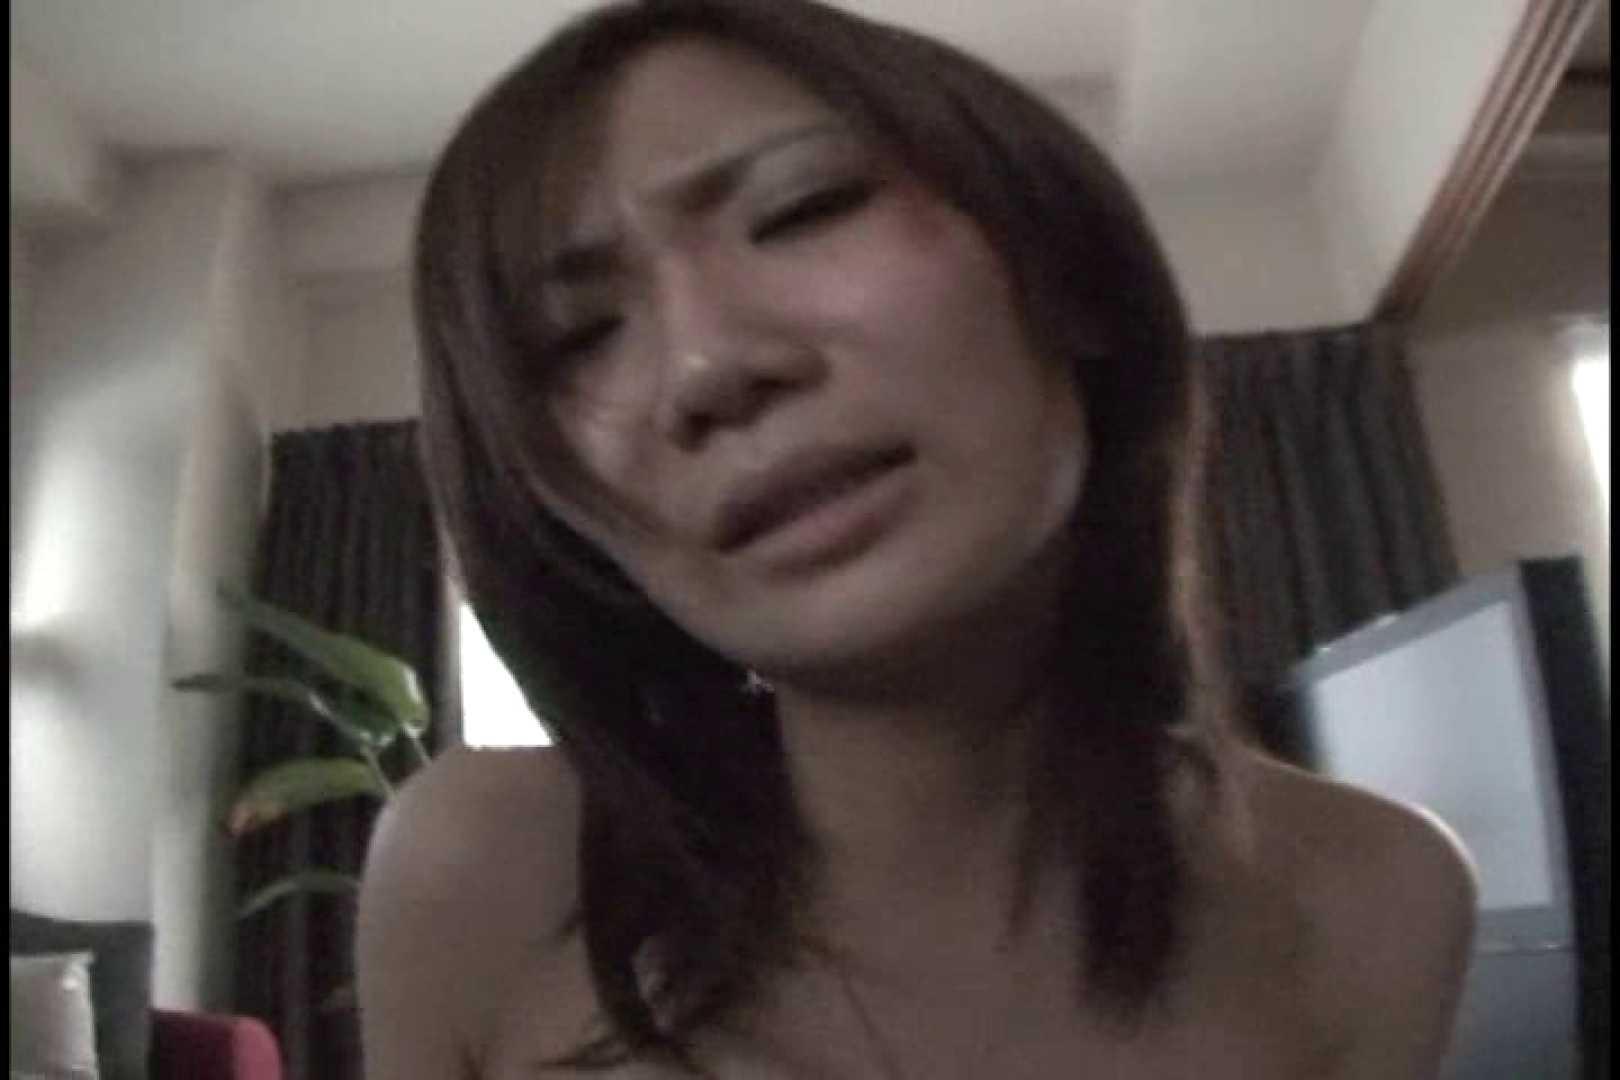 JDハンター全国ツアー vol.043 後編 女子大生のエロ動画   0  88PIX 81